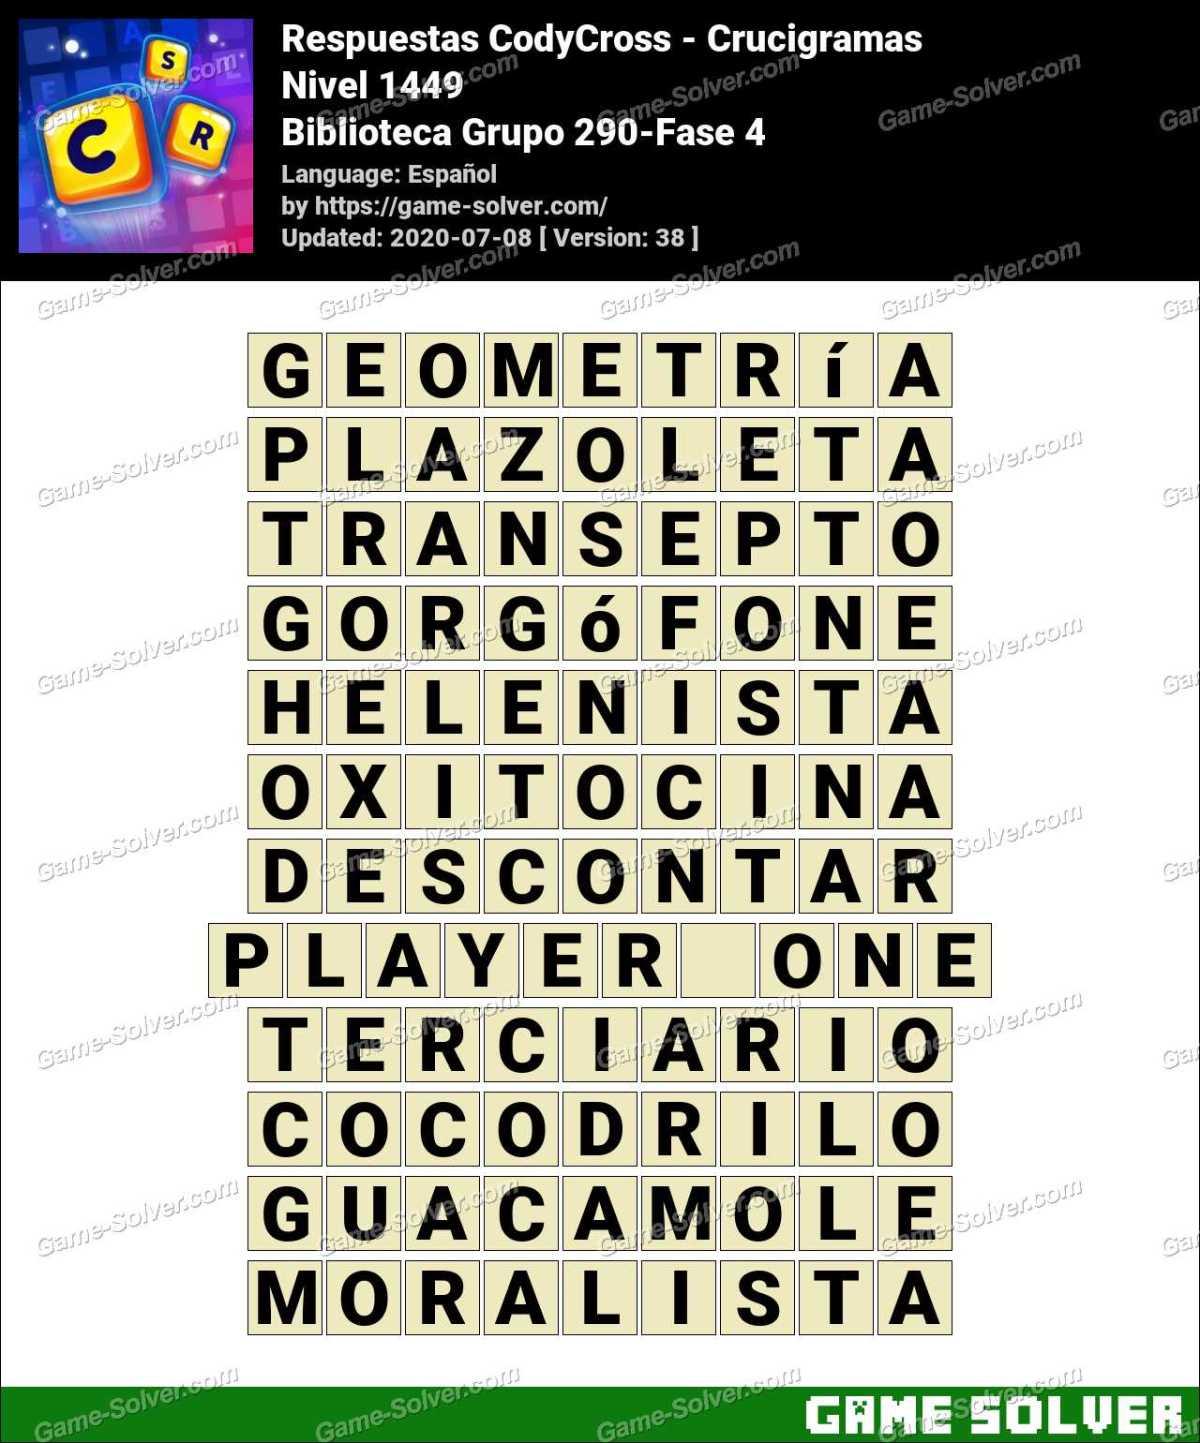 Respuestas CodyCross Biblioteca Grupo 290-Fase 4